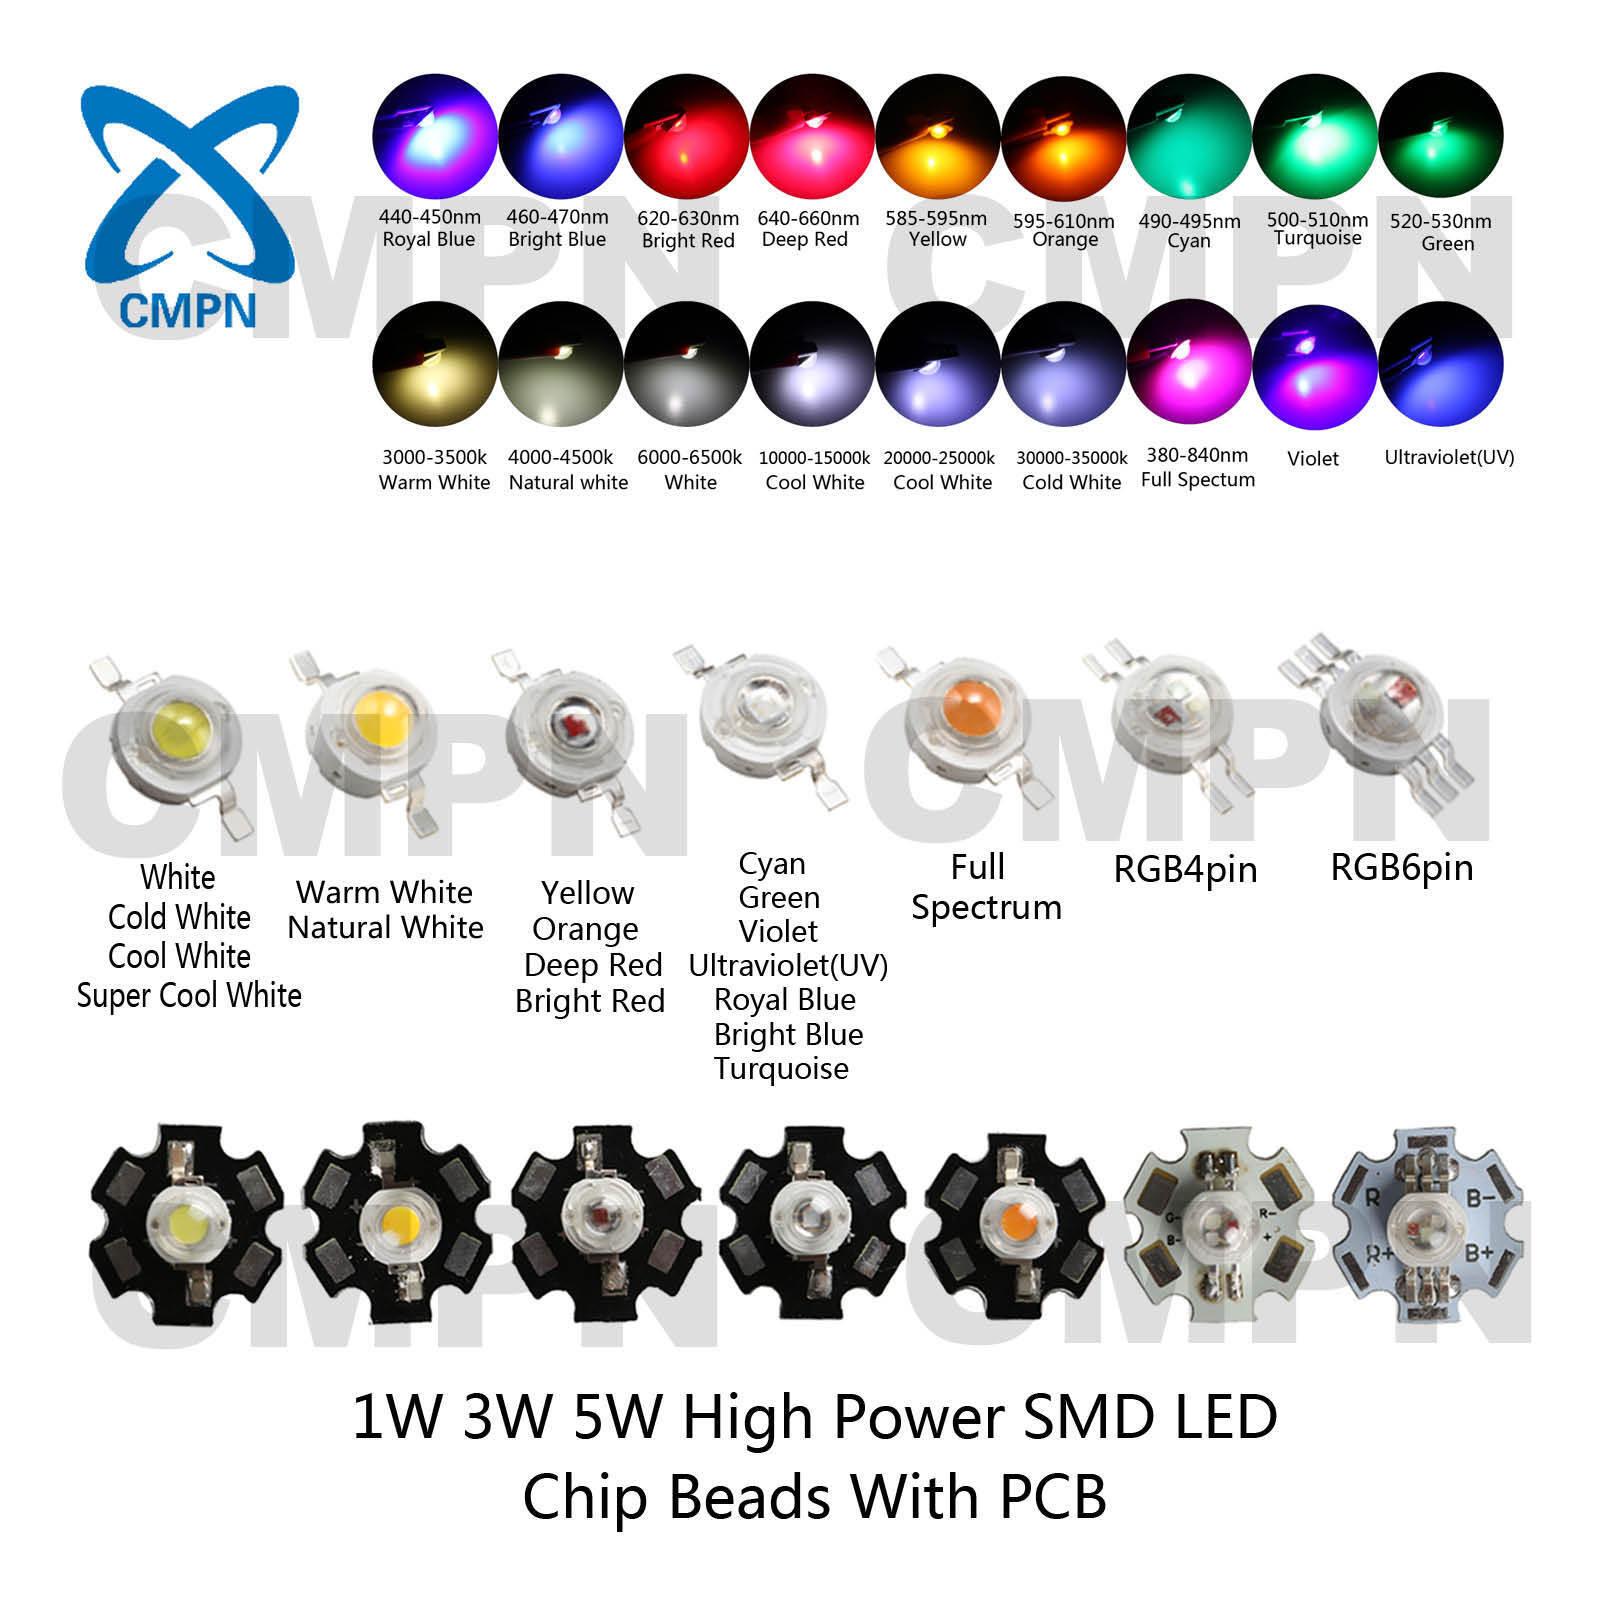 20W Watt High Power Cool Natural Warm White Deep Red Royal Blue Light LED Chip